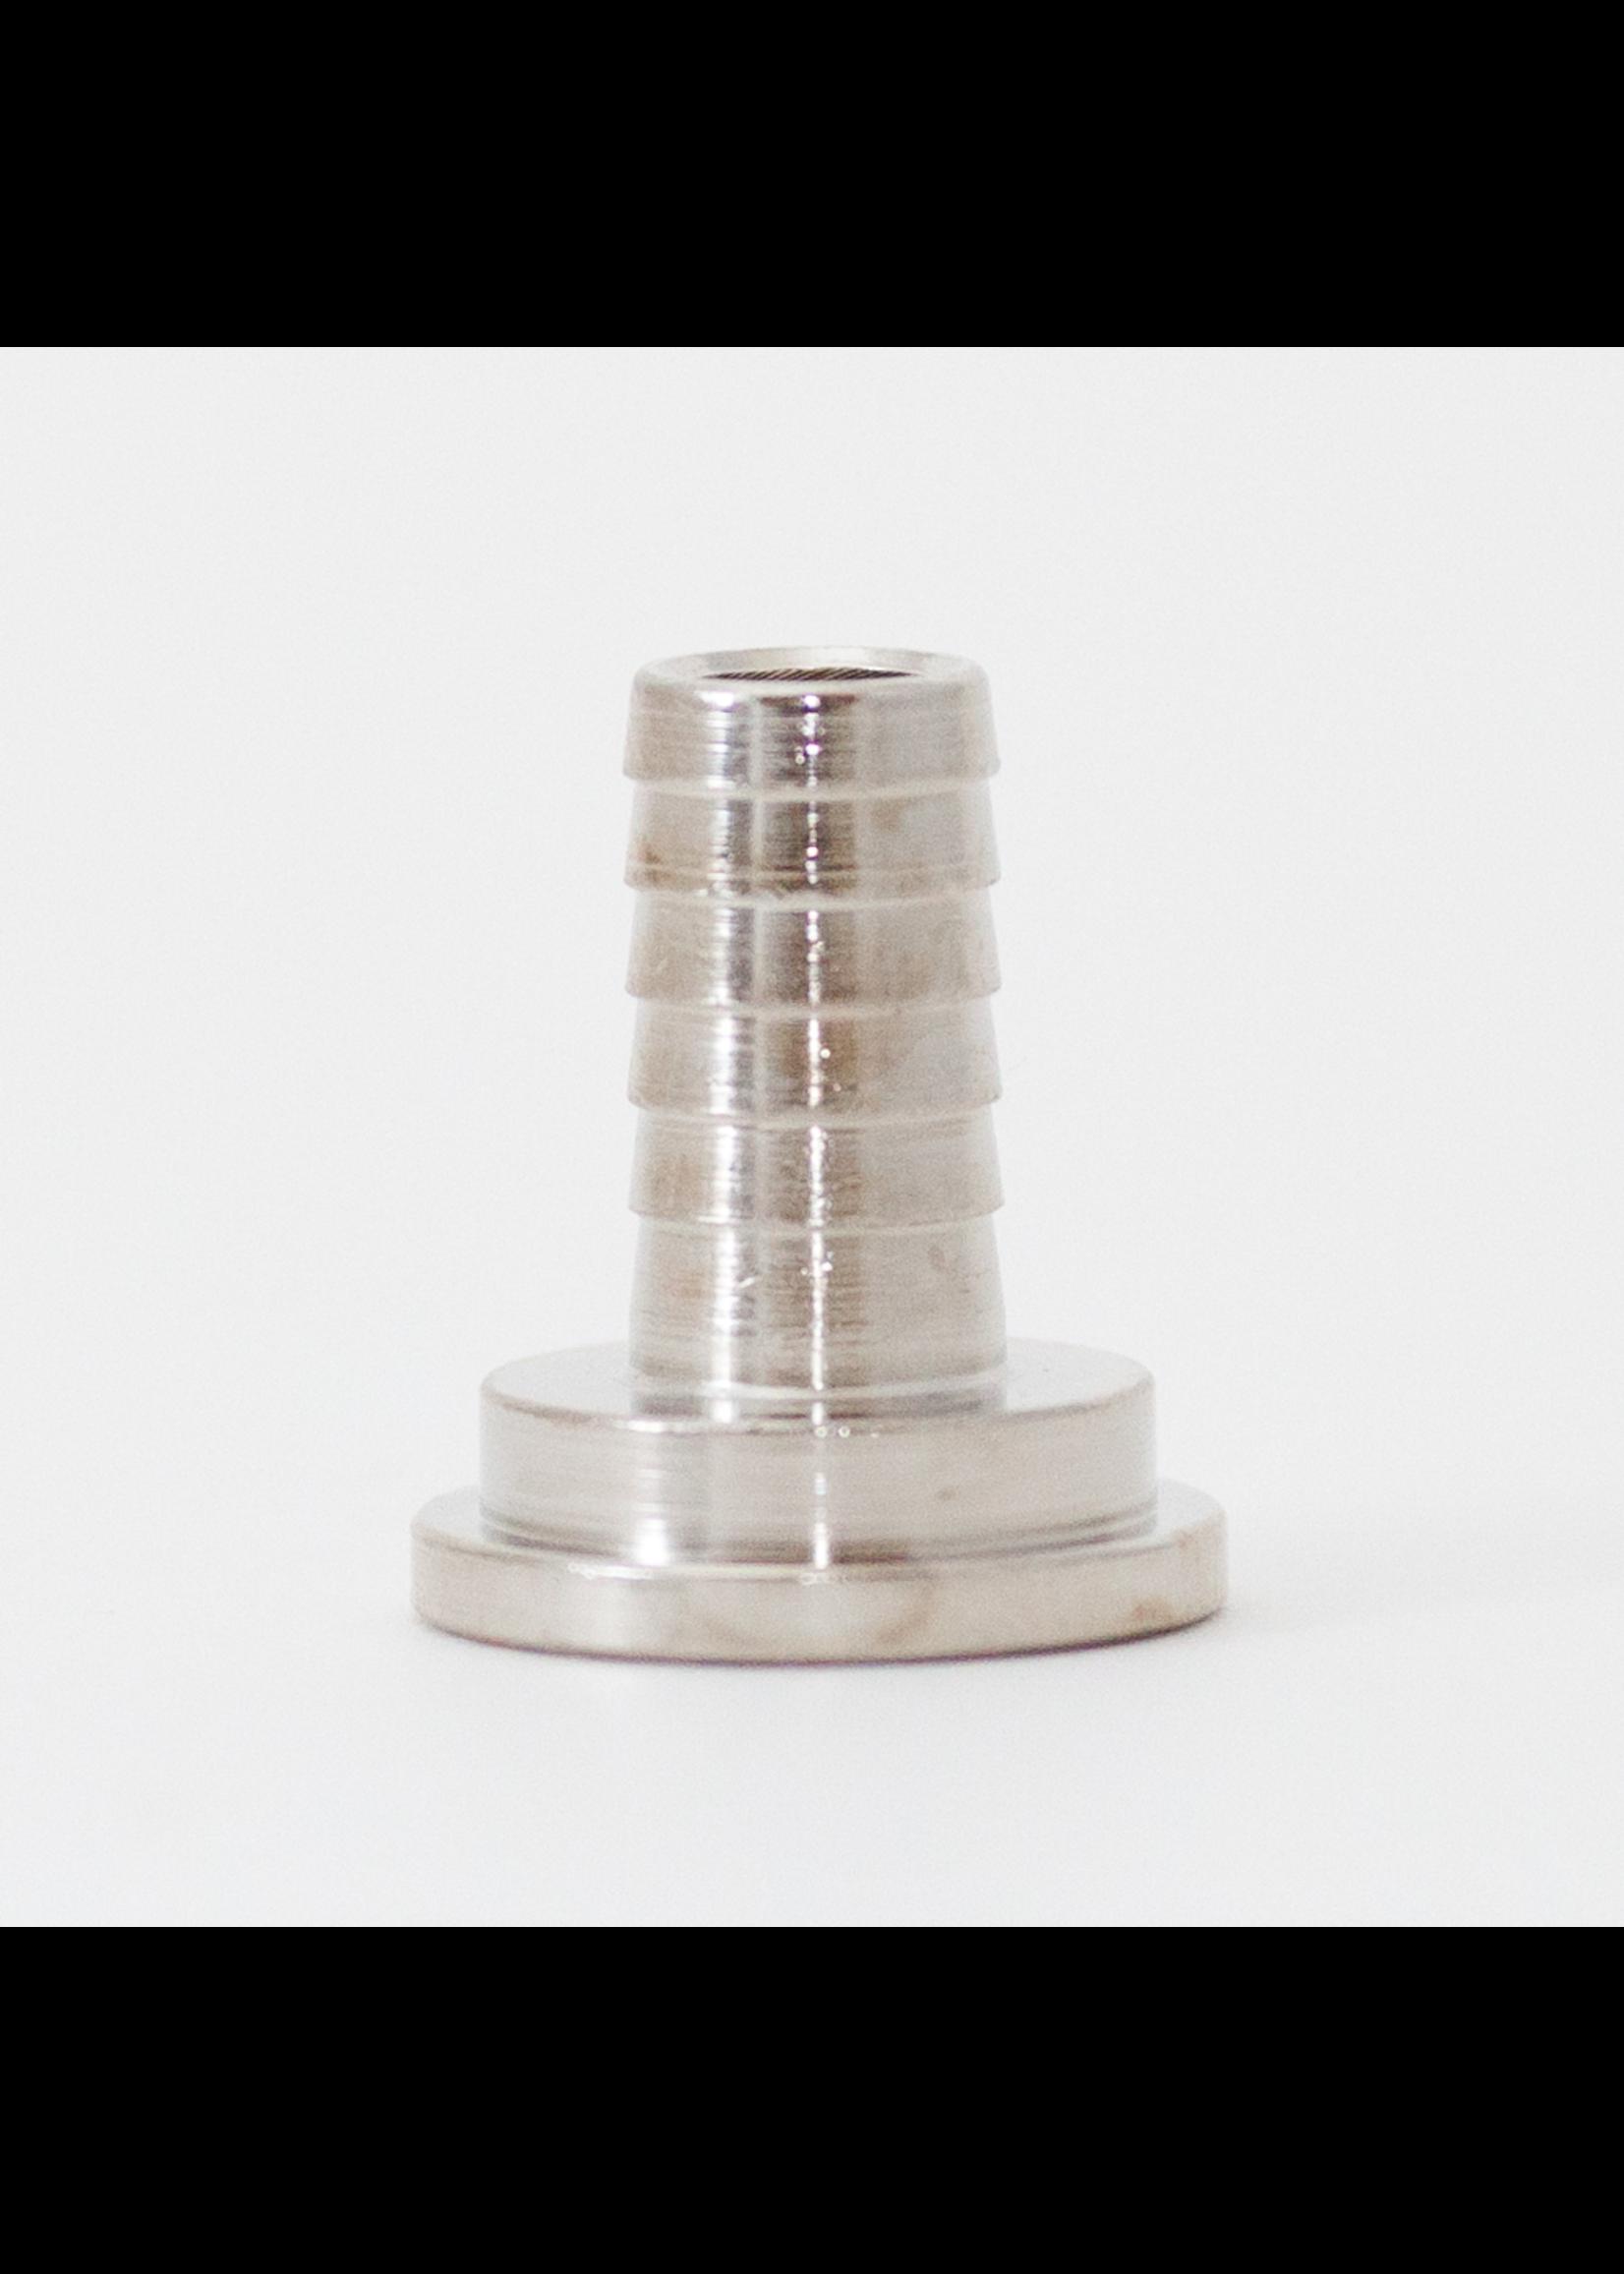 "Kegging Tailpiece - 1/4"" Barb - Chromed Brass - #F06"